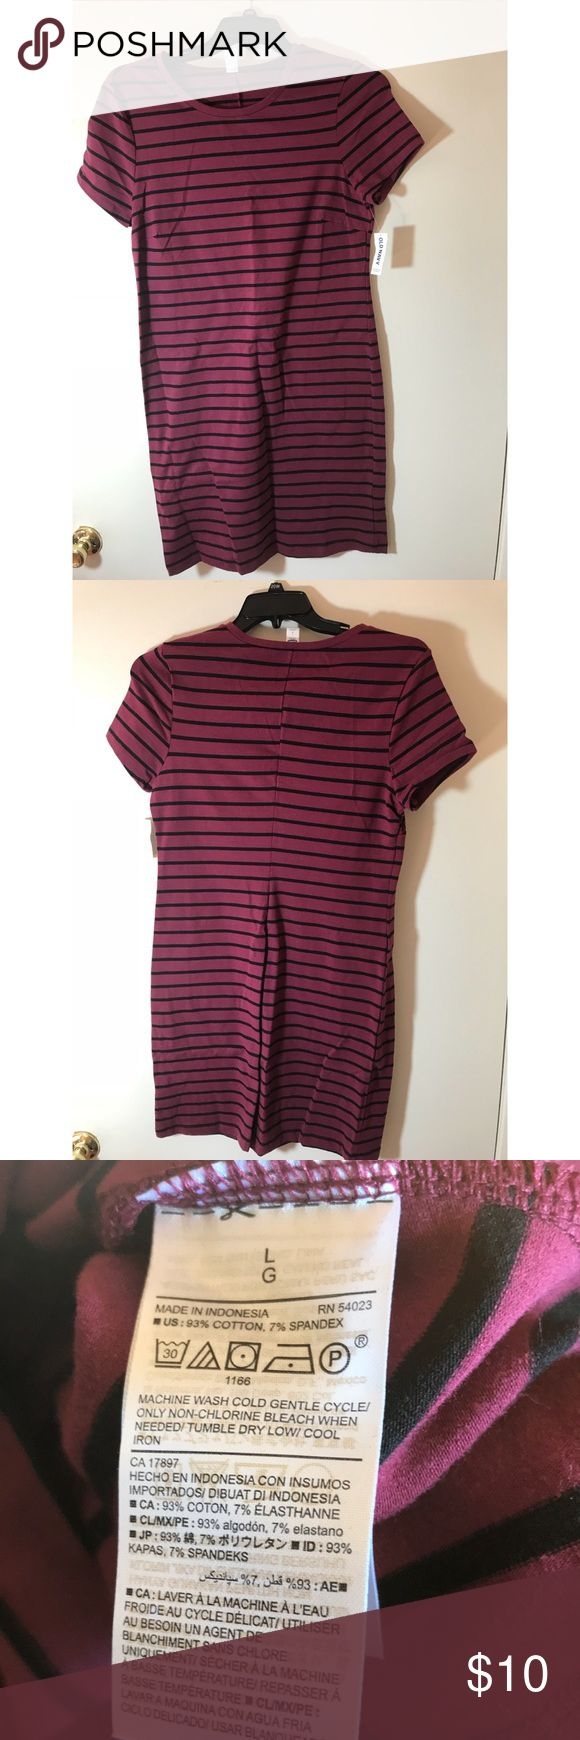 🆕 OLD NAVY Burgundy&Black Striped Bodycon Dress! Brand new. Never worn. Super flattering Bodycon dress. Old Navy Dresses Midi